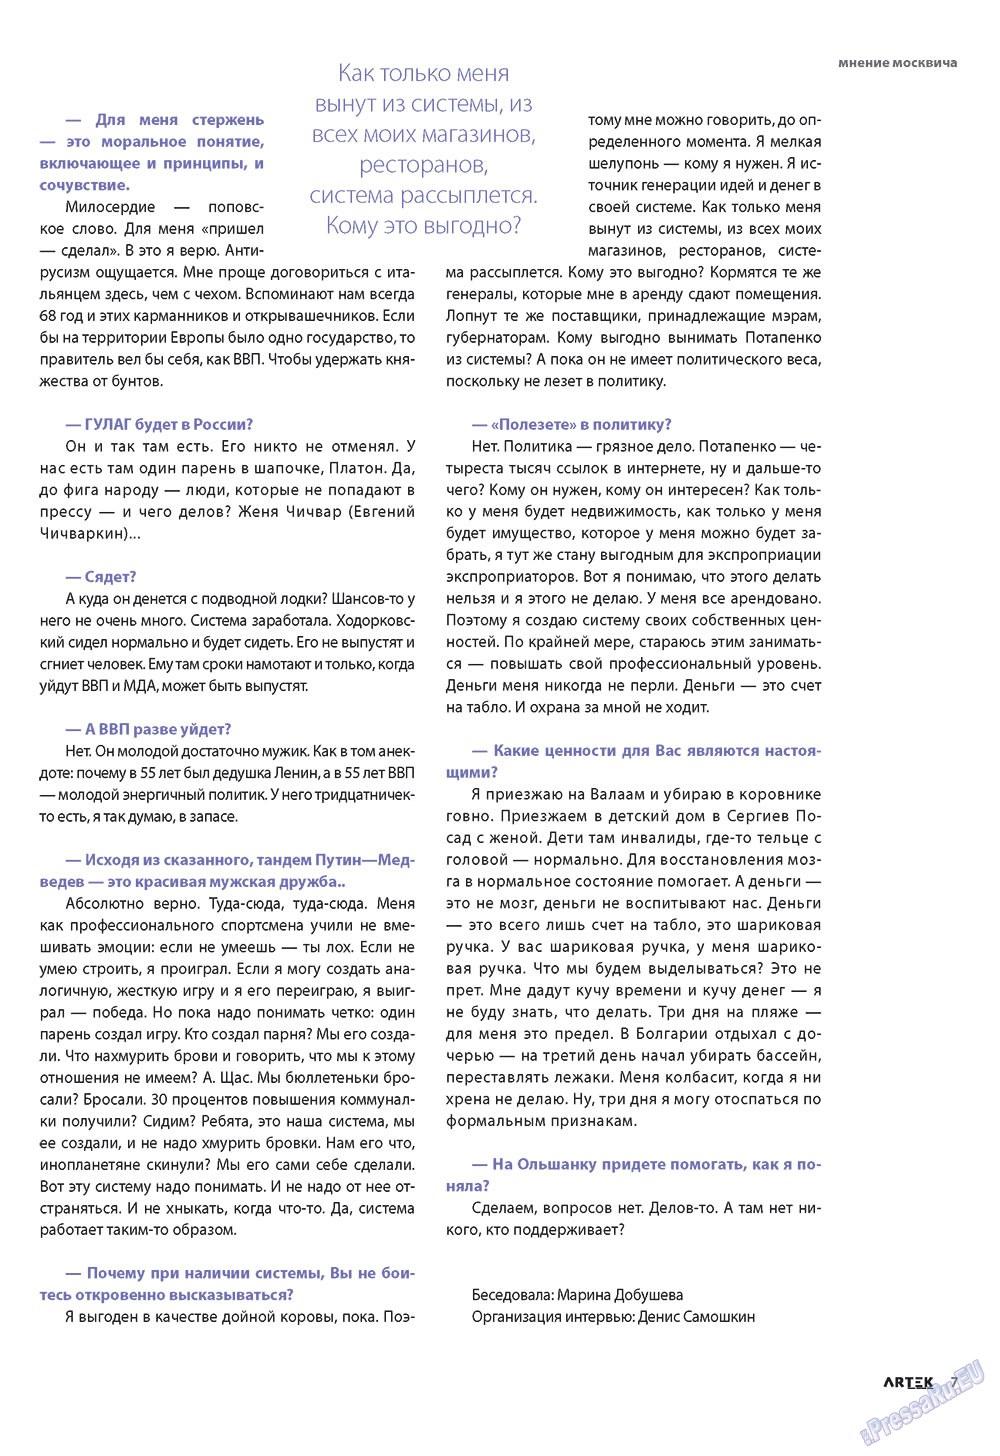 Артек (журнал). 2009 год, номер 4, стр. 7